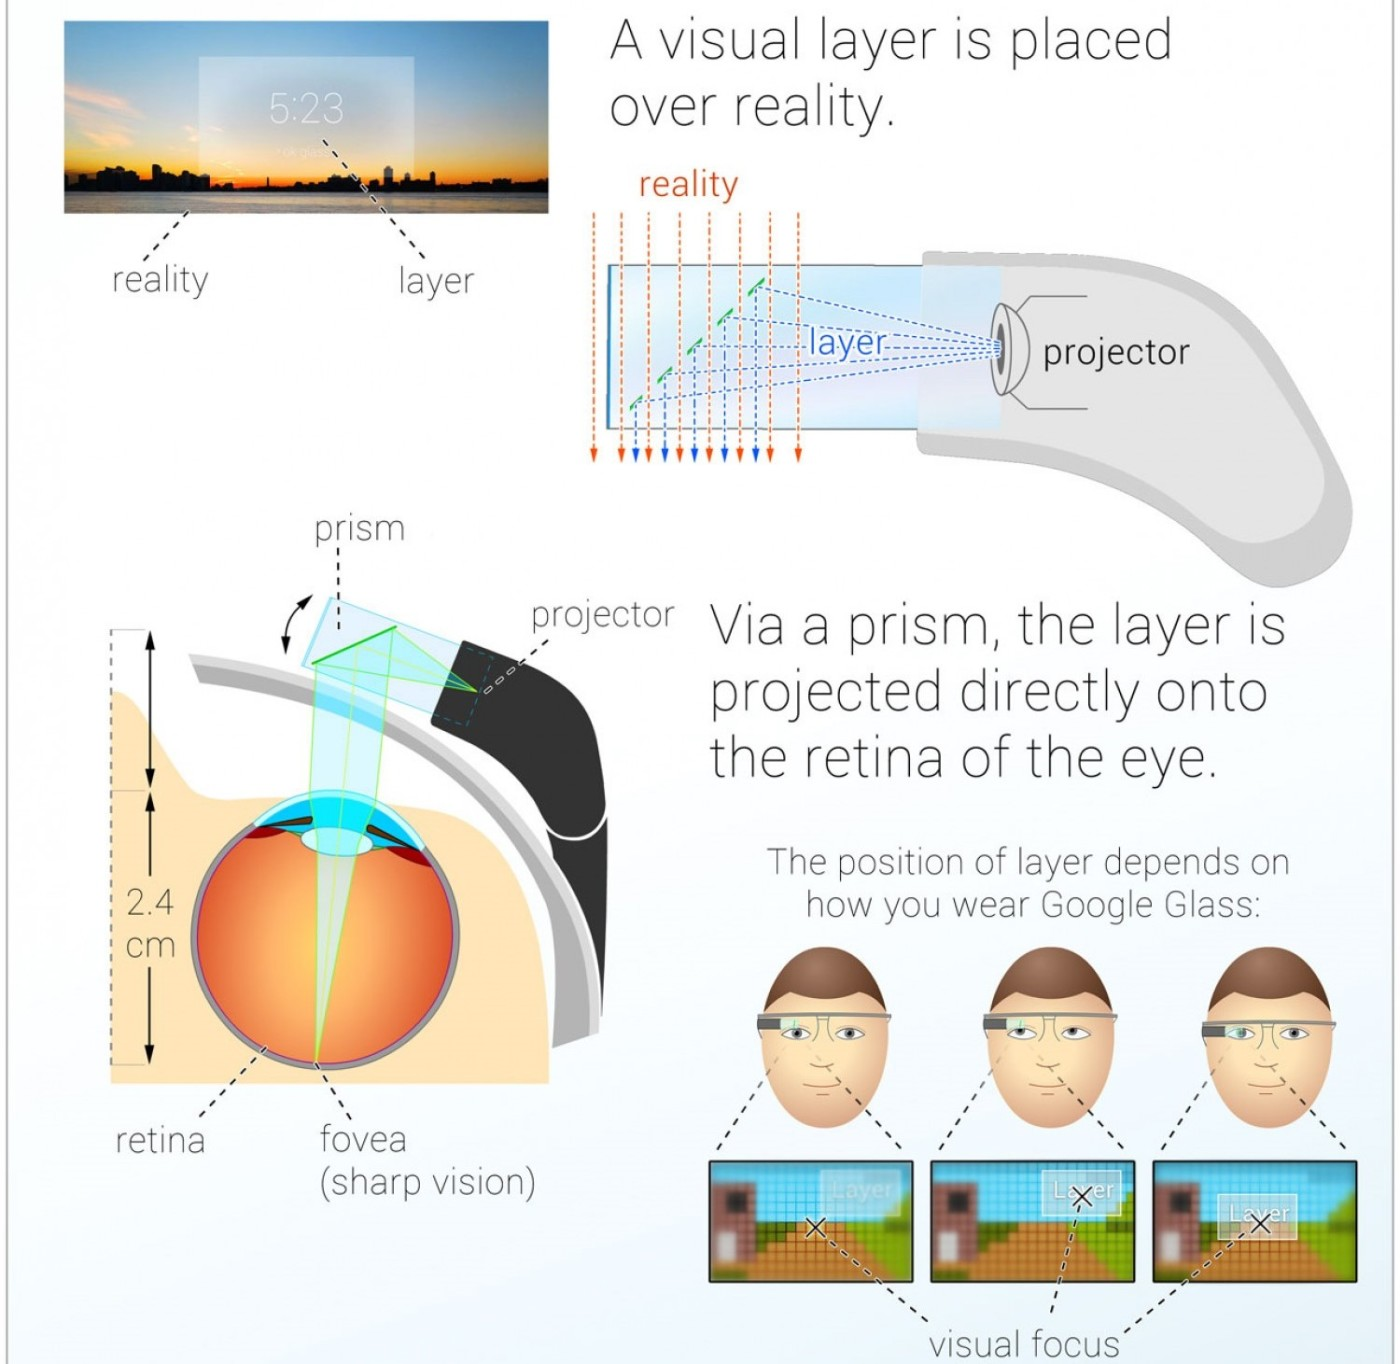 Virtual and real layers matching